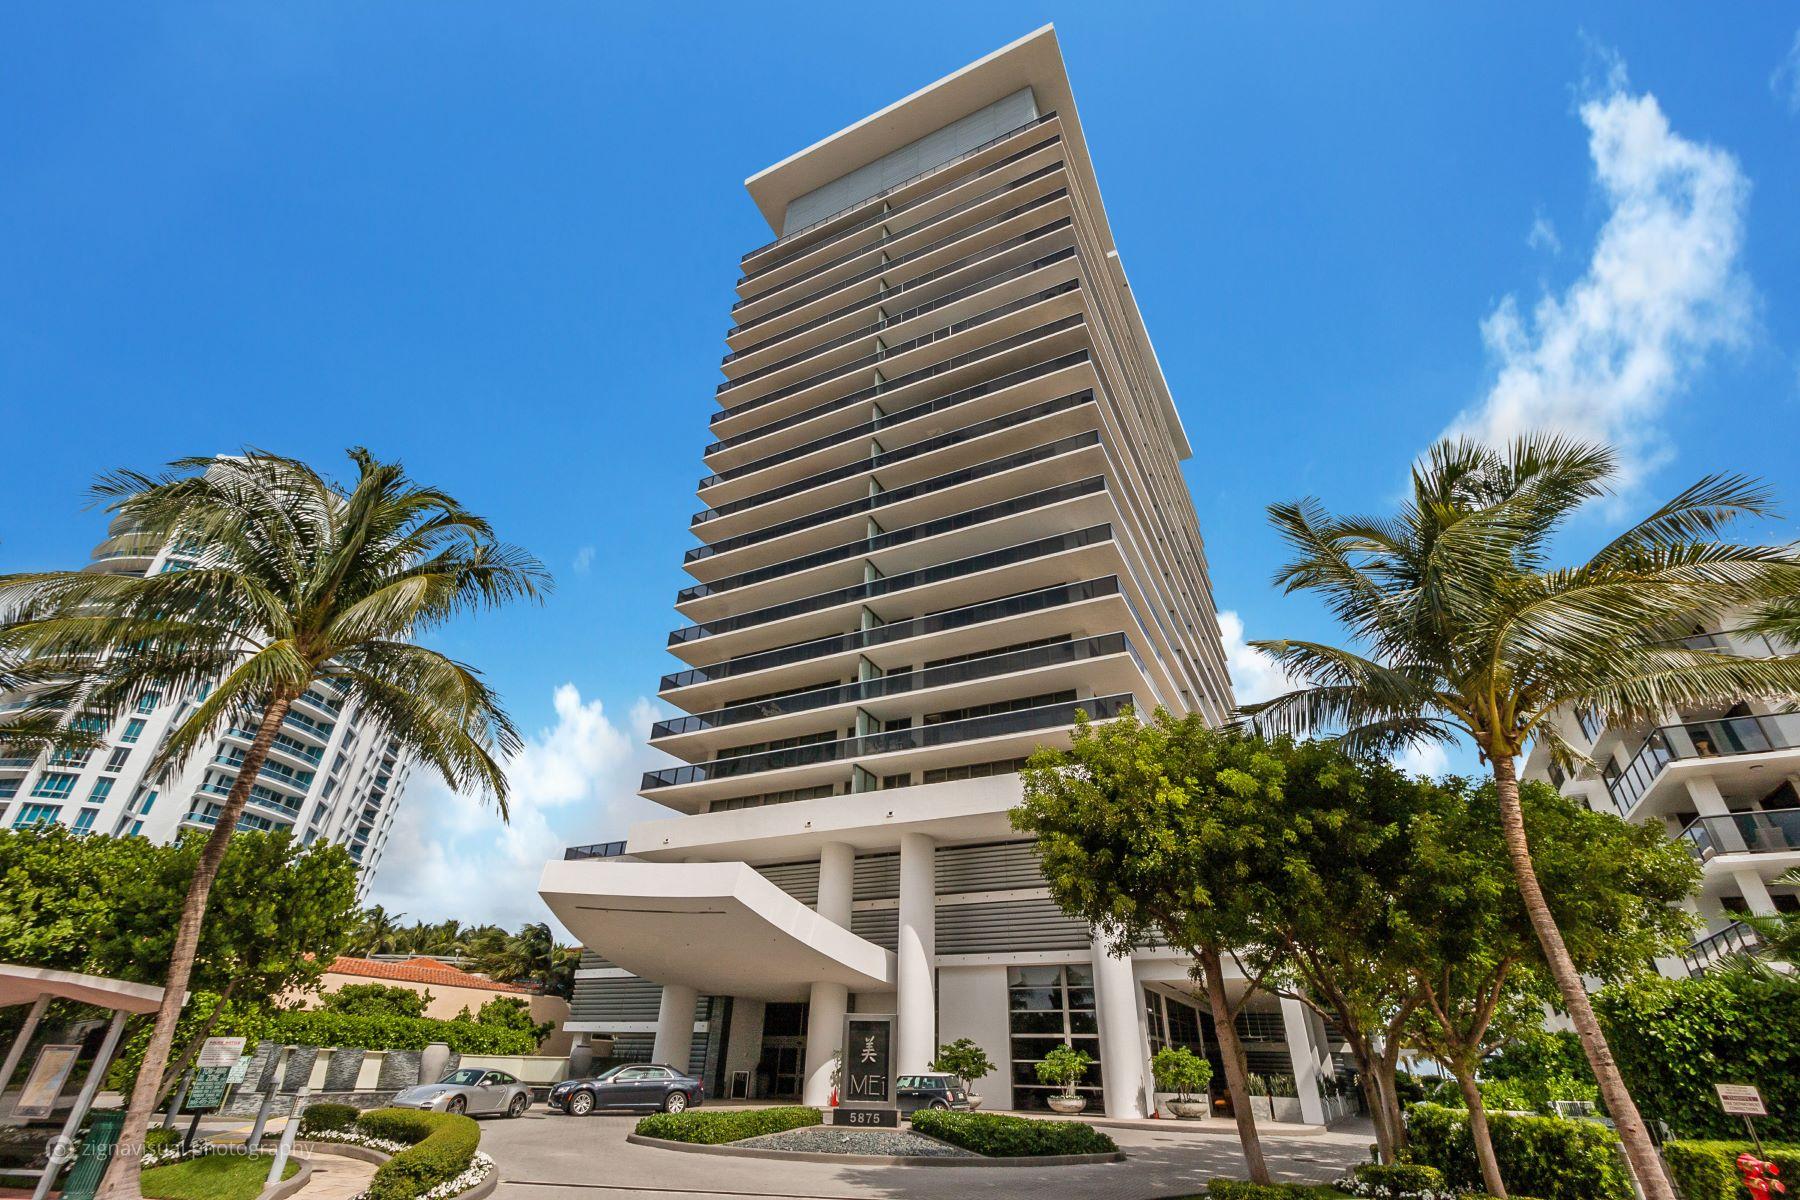 Condominium for Sale at 5875 Collins Ave #601 5875 Collins Ave 601 Miami Beach, Florida, 33140 United States